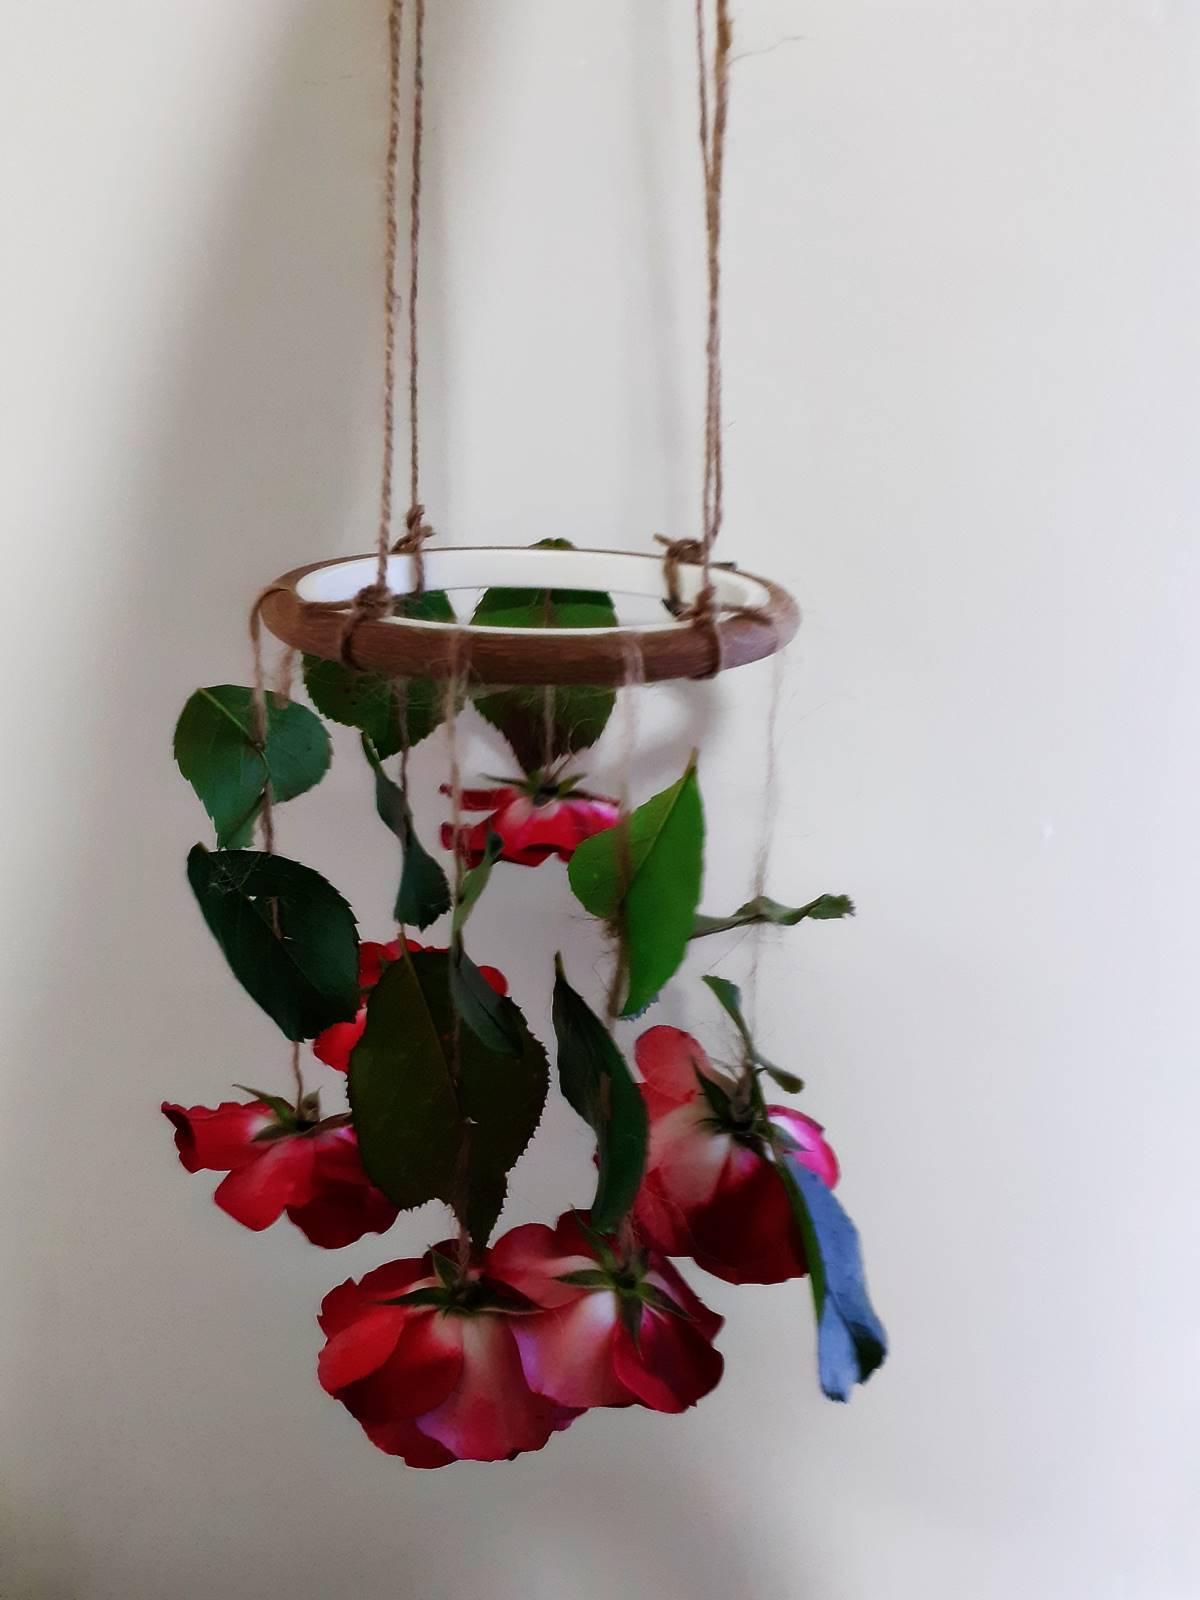 Roses diy mobile cadre photo blog20200526 131140